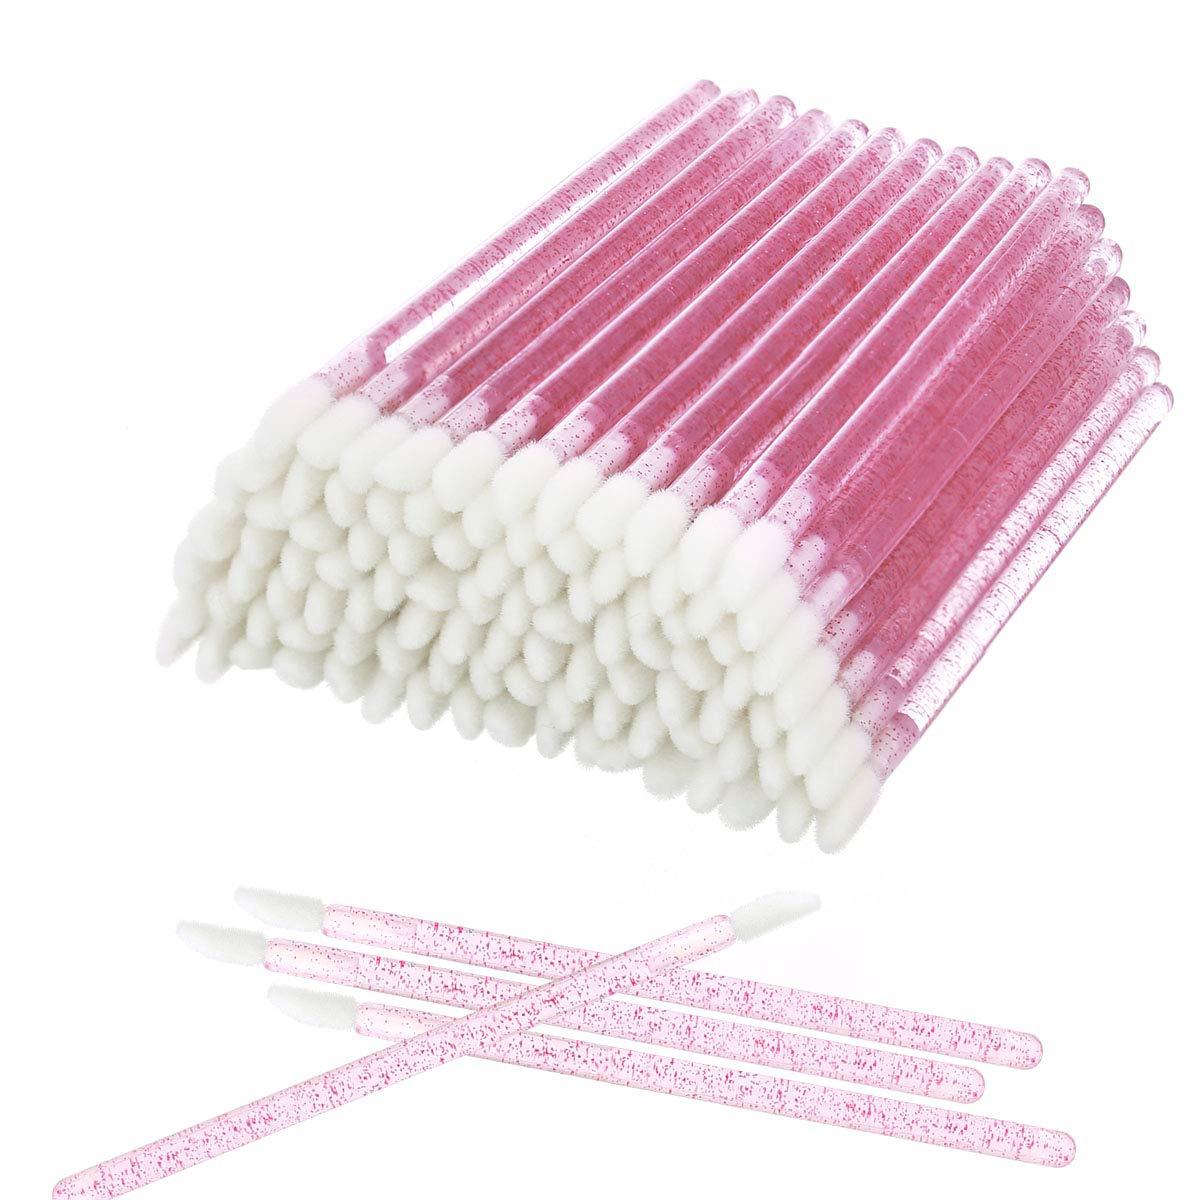 Elisel 100 Pcs Disposable Crystal Lip Brushes Make Up Lip Brushes Lipstick Lip Gloss Wands Eyeshadow Brushes Applicator Tool Makeup Beauty Tool Kits (Rose): Beauty